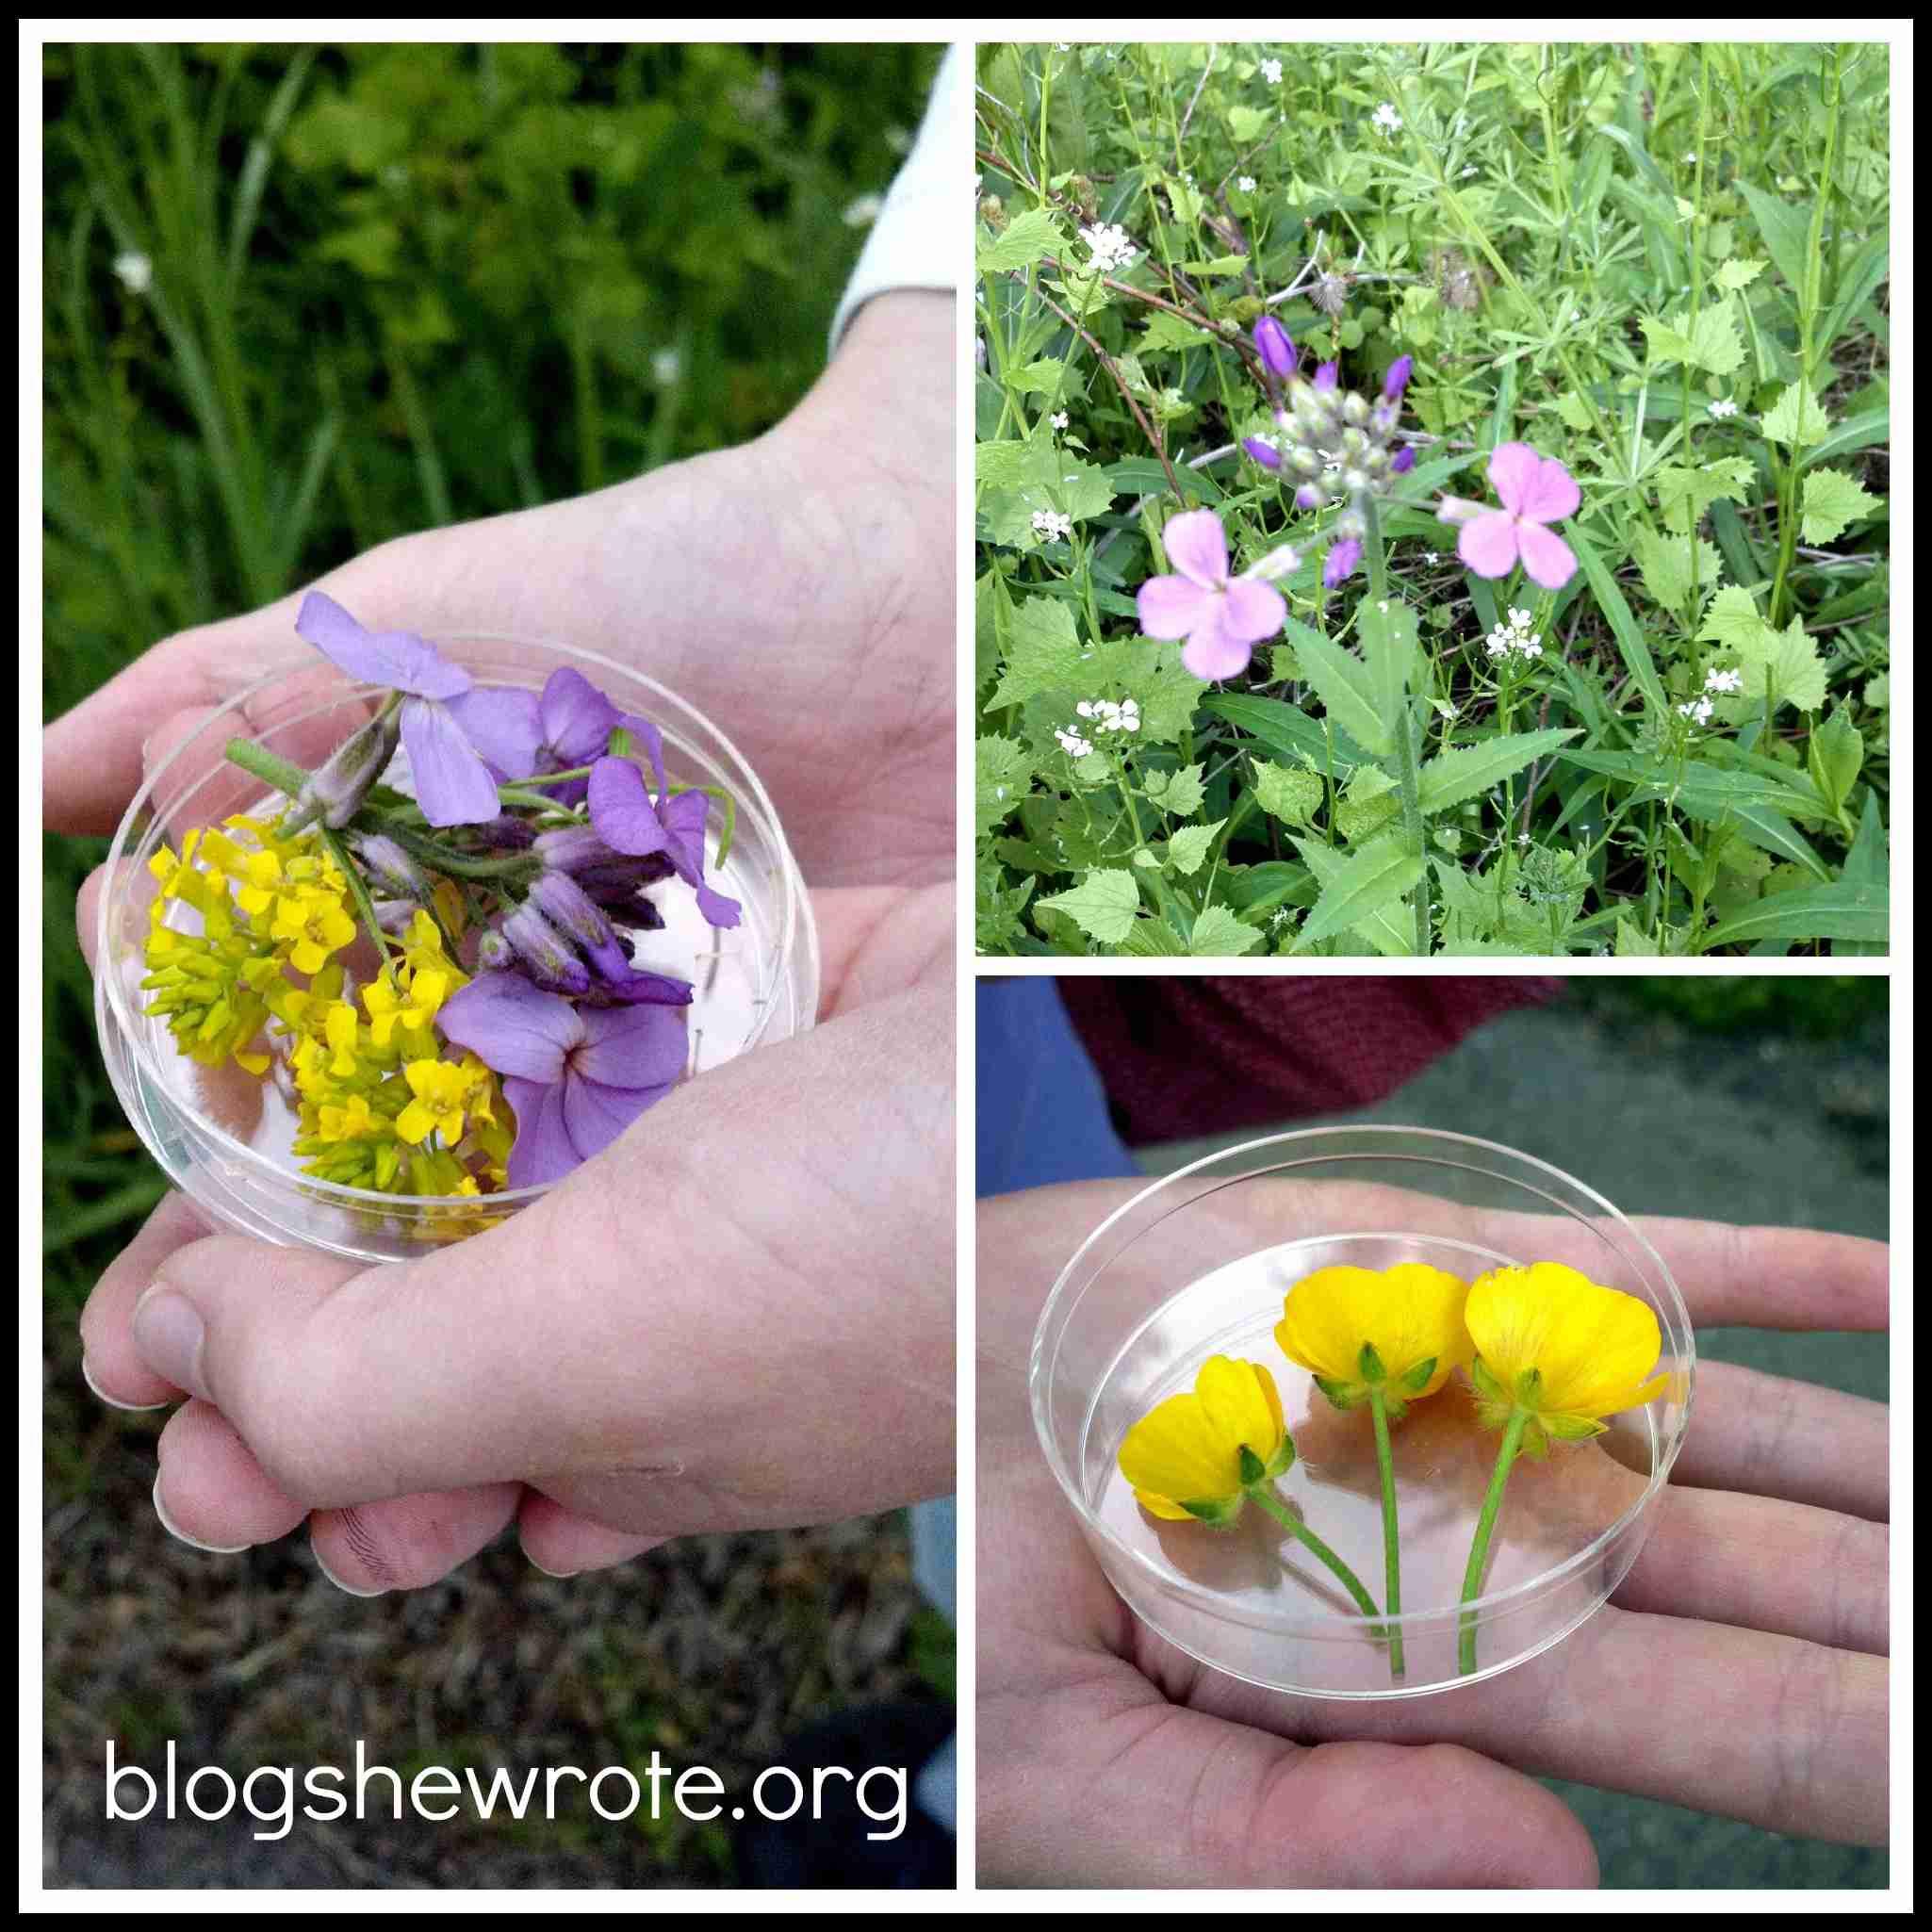 Blog She Wrote: Flower Pressing